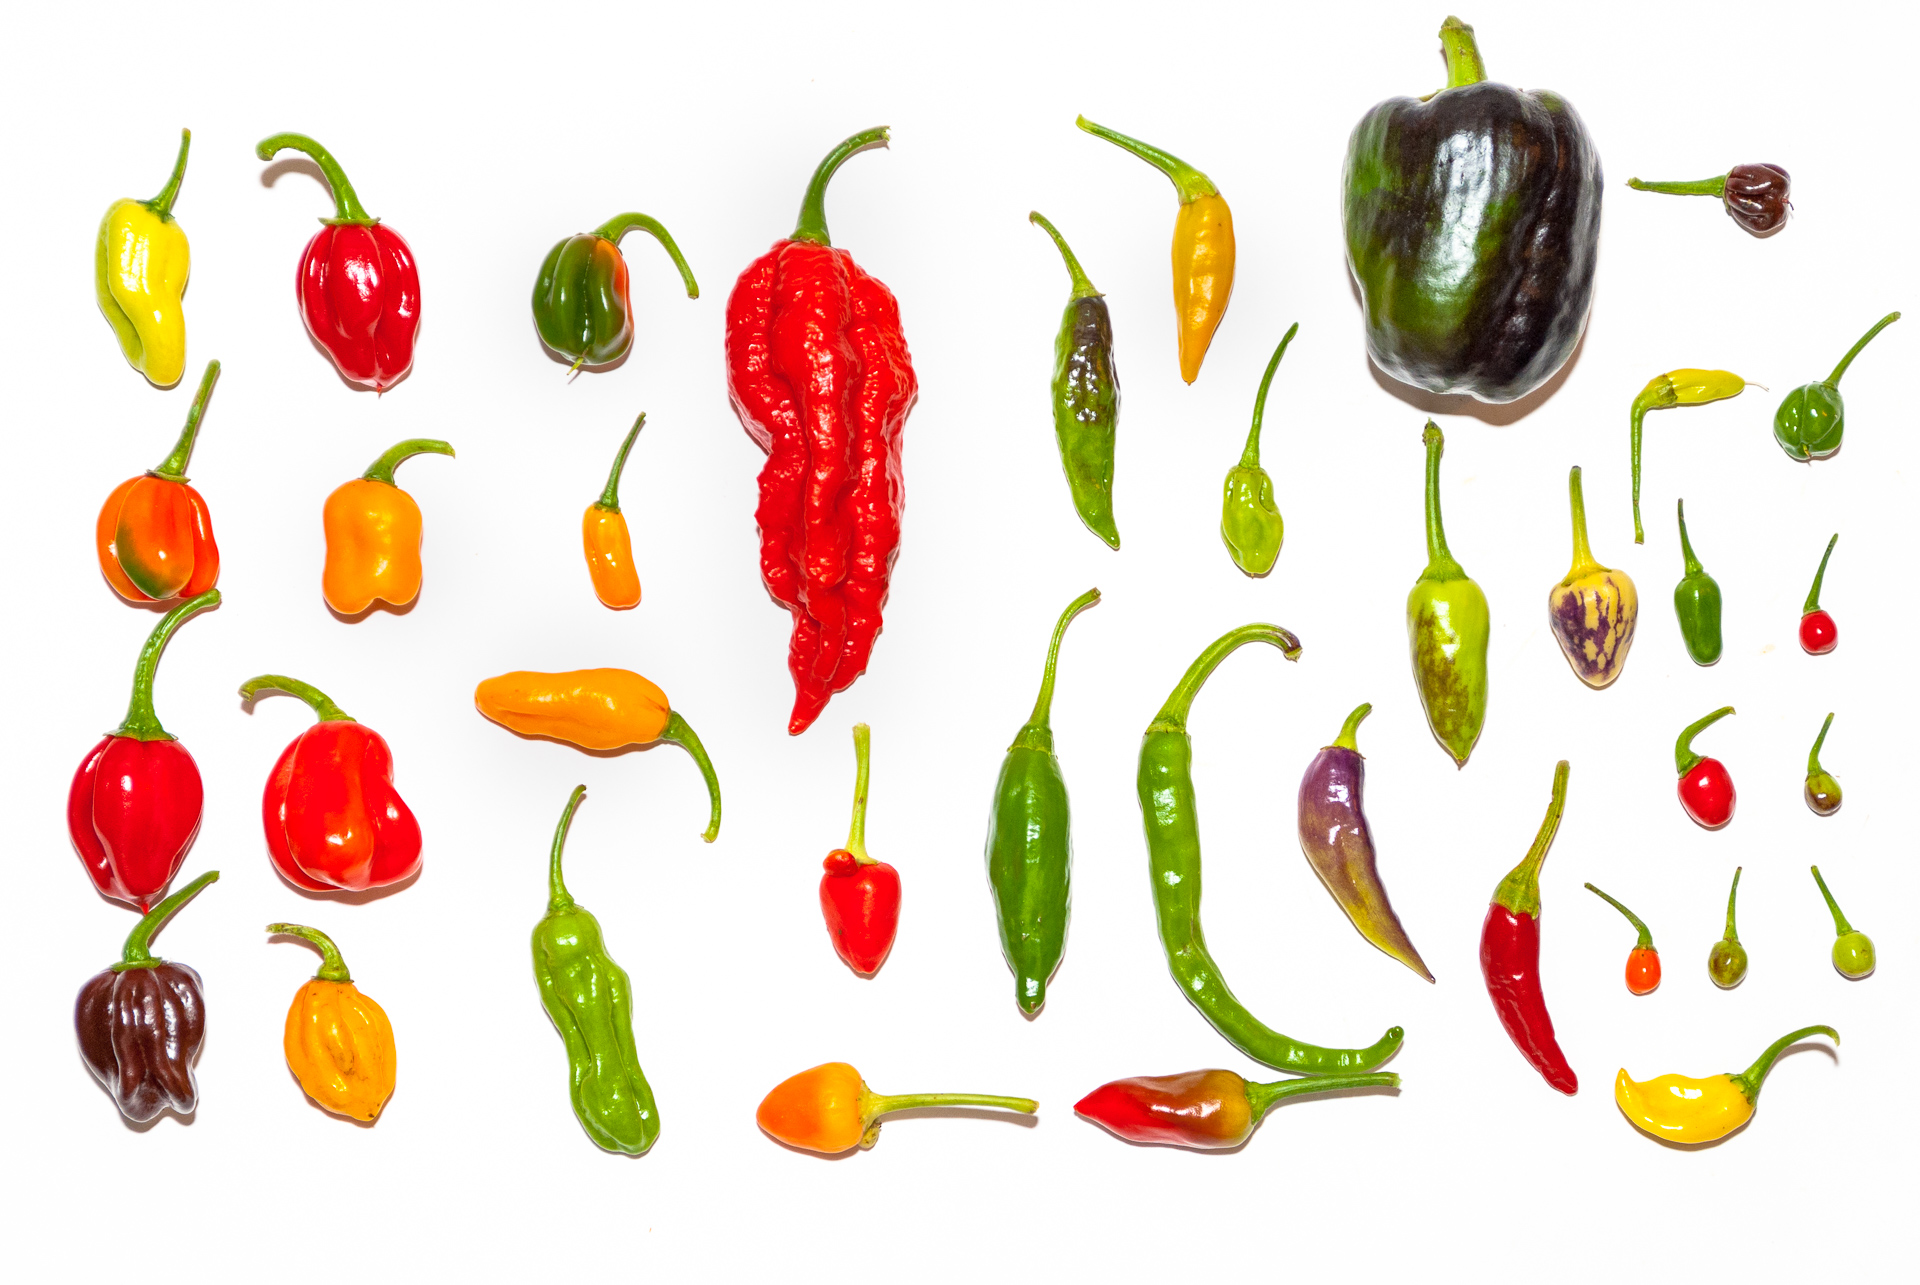 Chilisorte